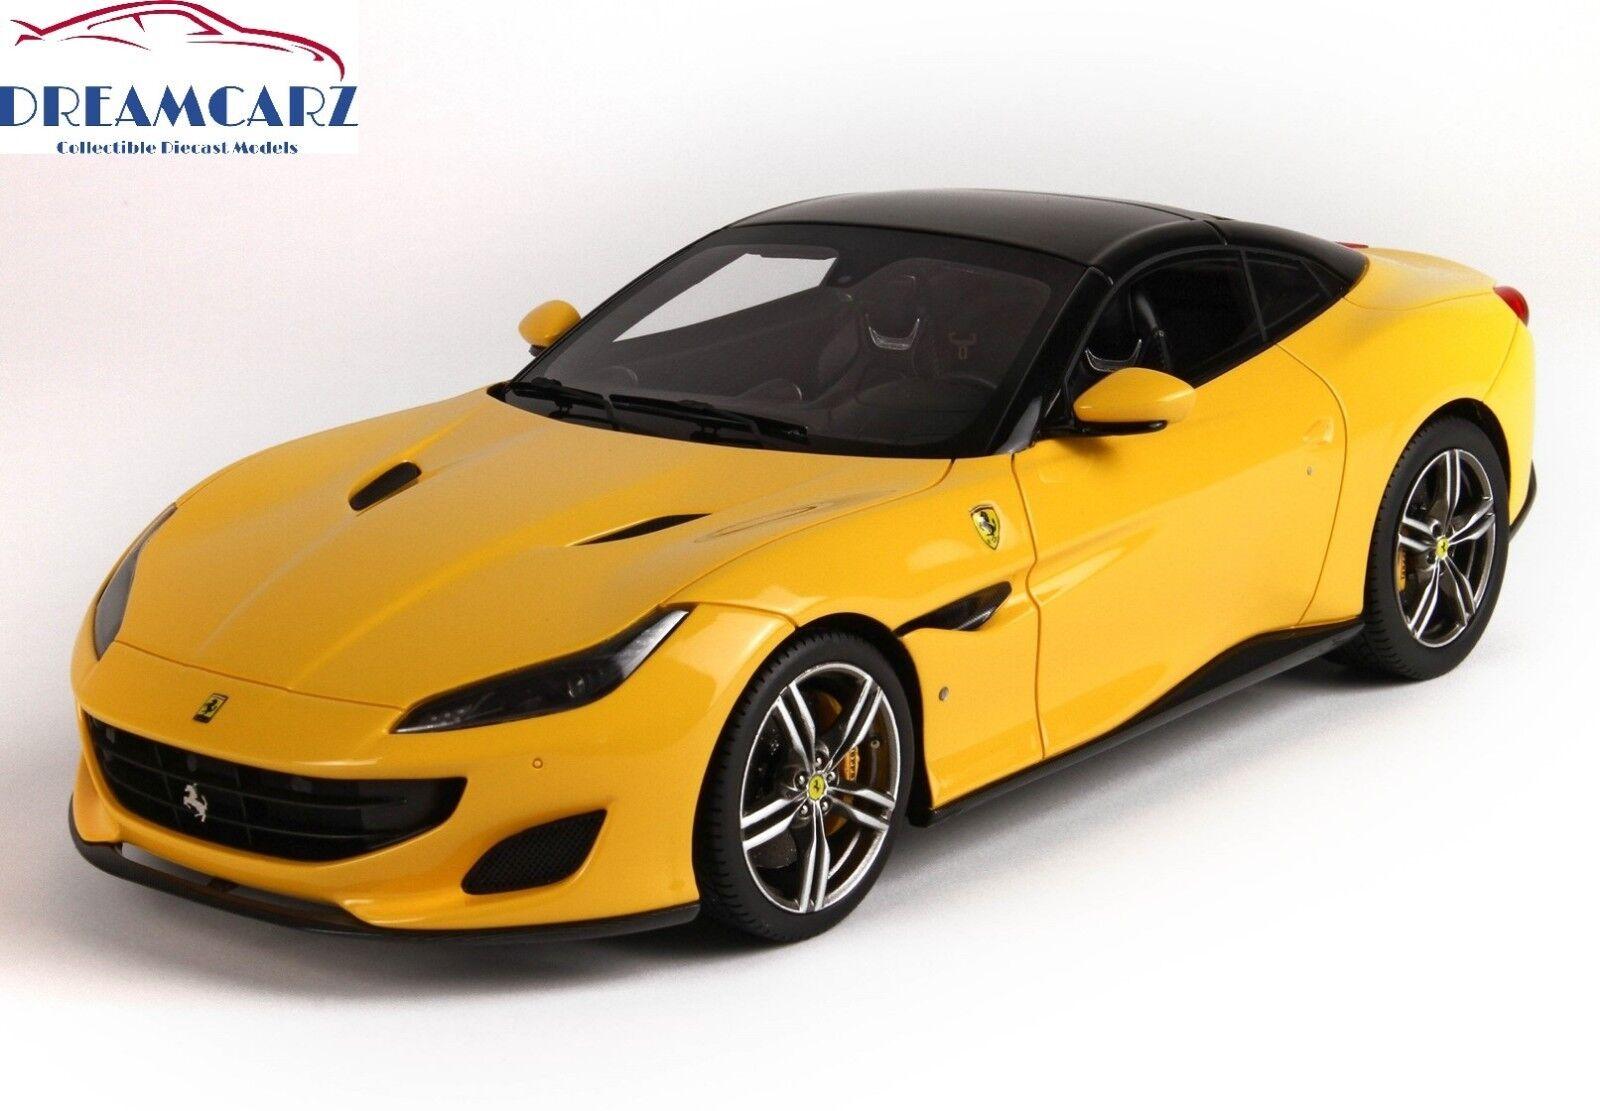 BBR 1/18 Ferrari Portofino Closed P18157DGB - with Display Case, Limited 12 pcs!